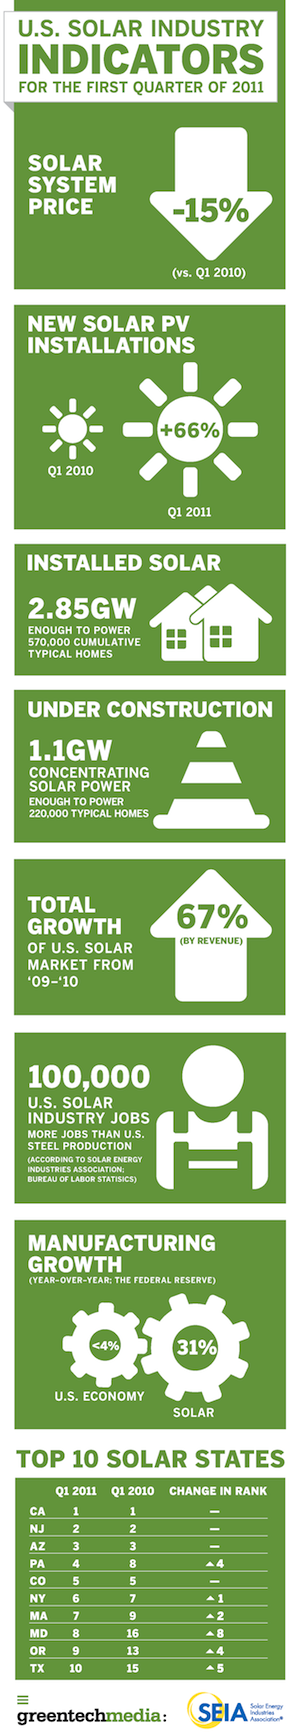 solar statistics 2011 Q1